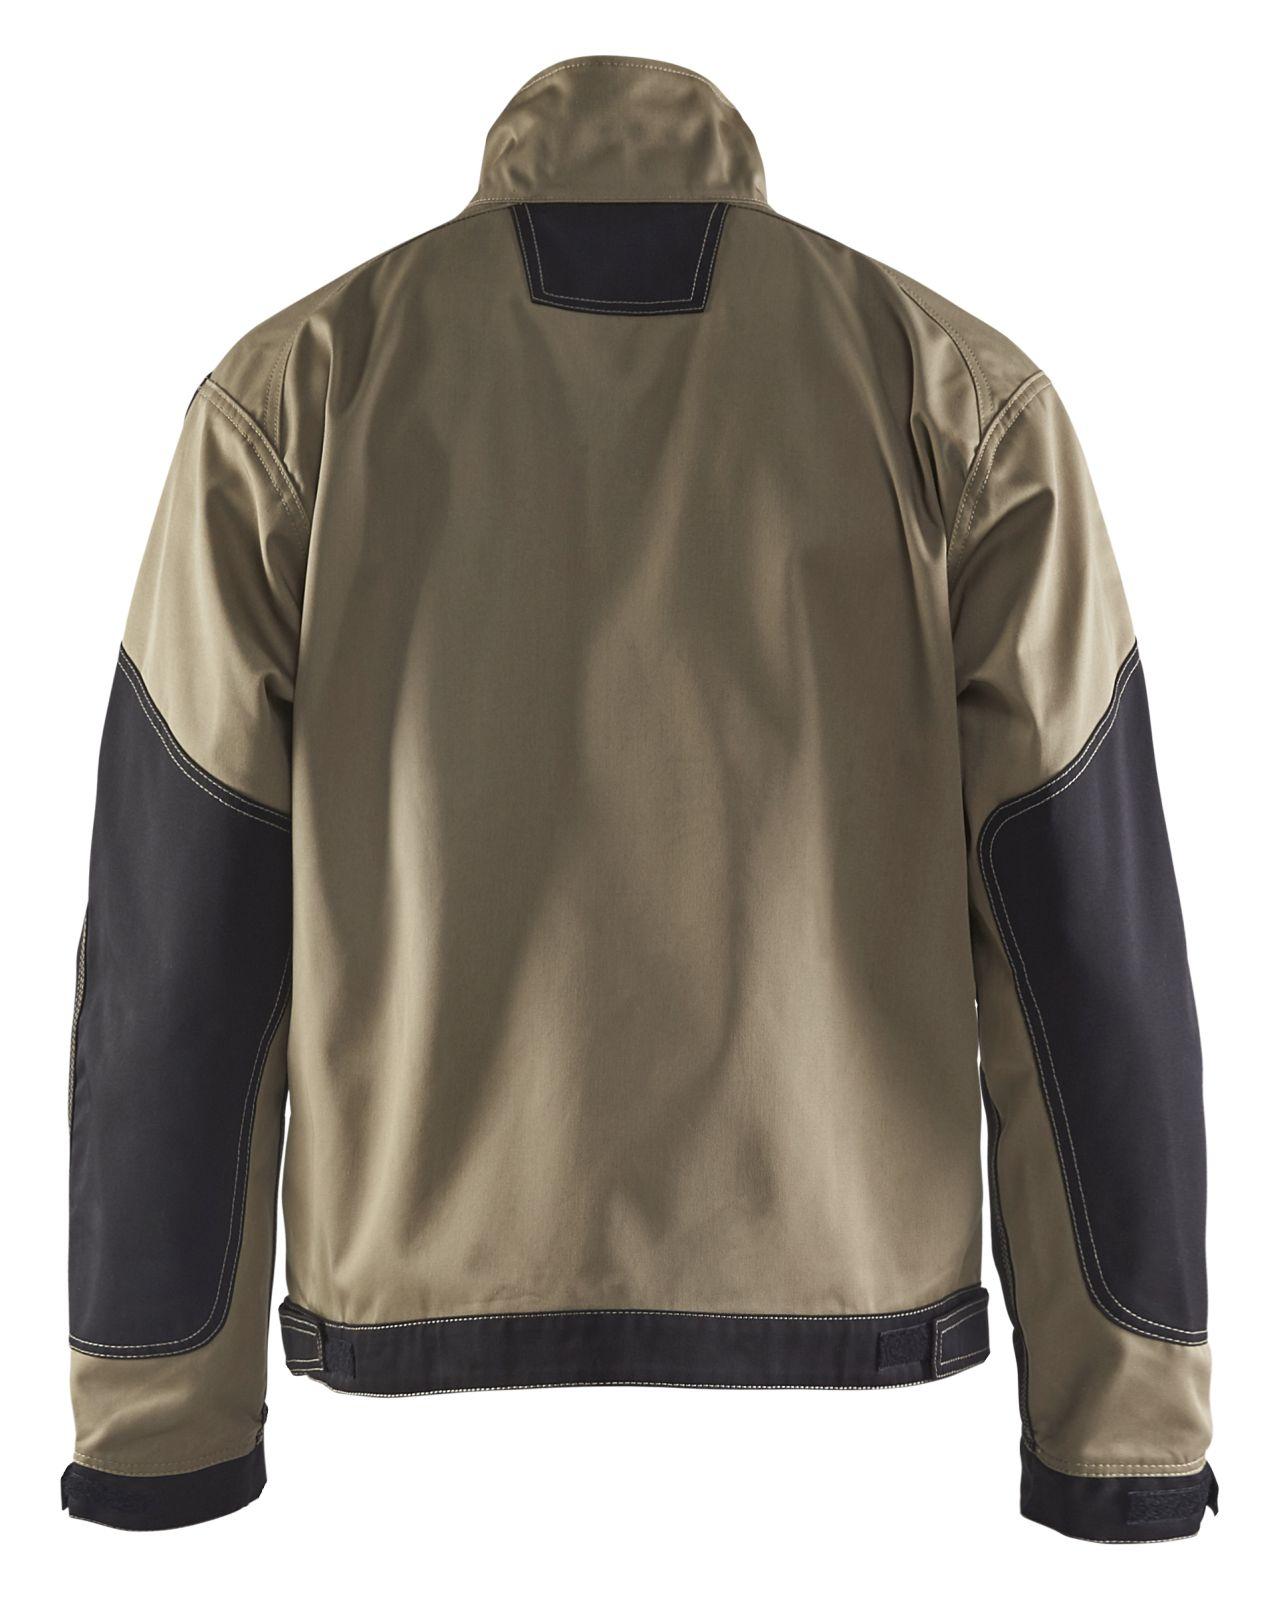 Blaklader Combi-jacks 40631860 khaki-zwart(2499)